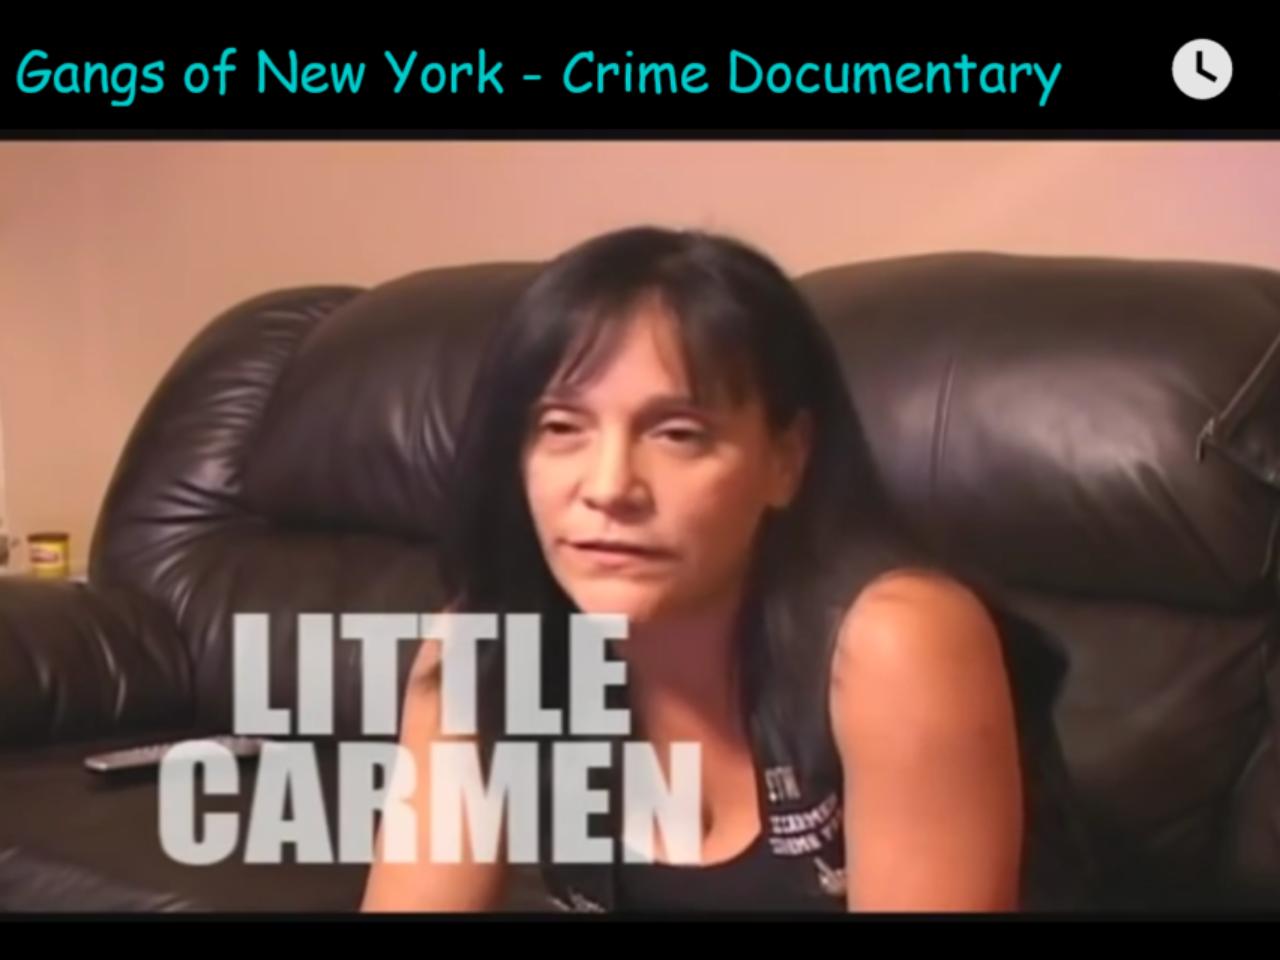 Gangs & Child Abandonment